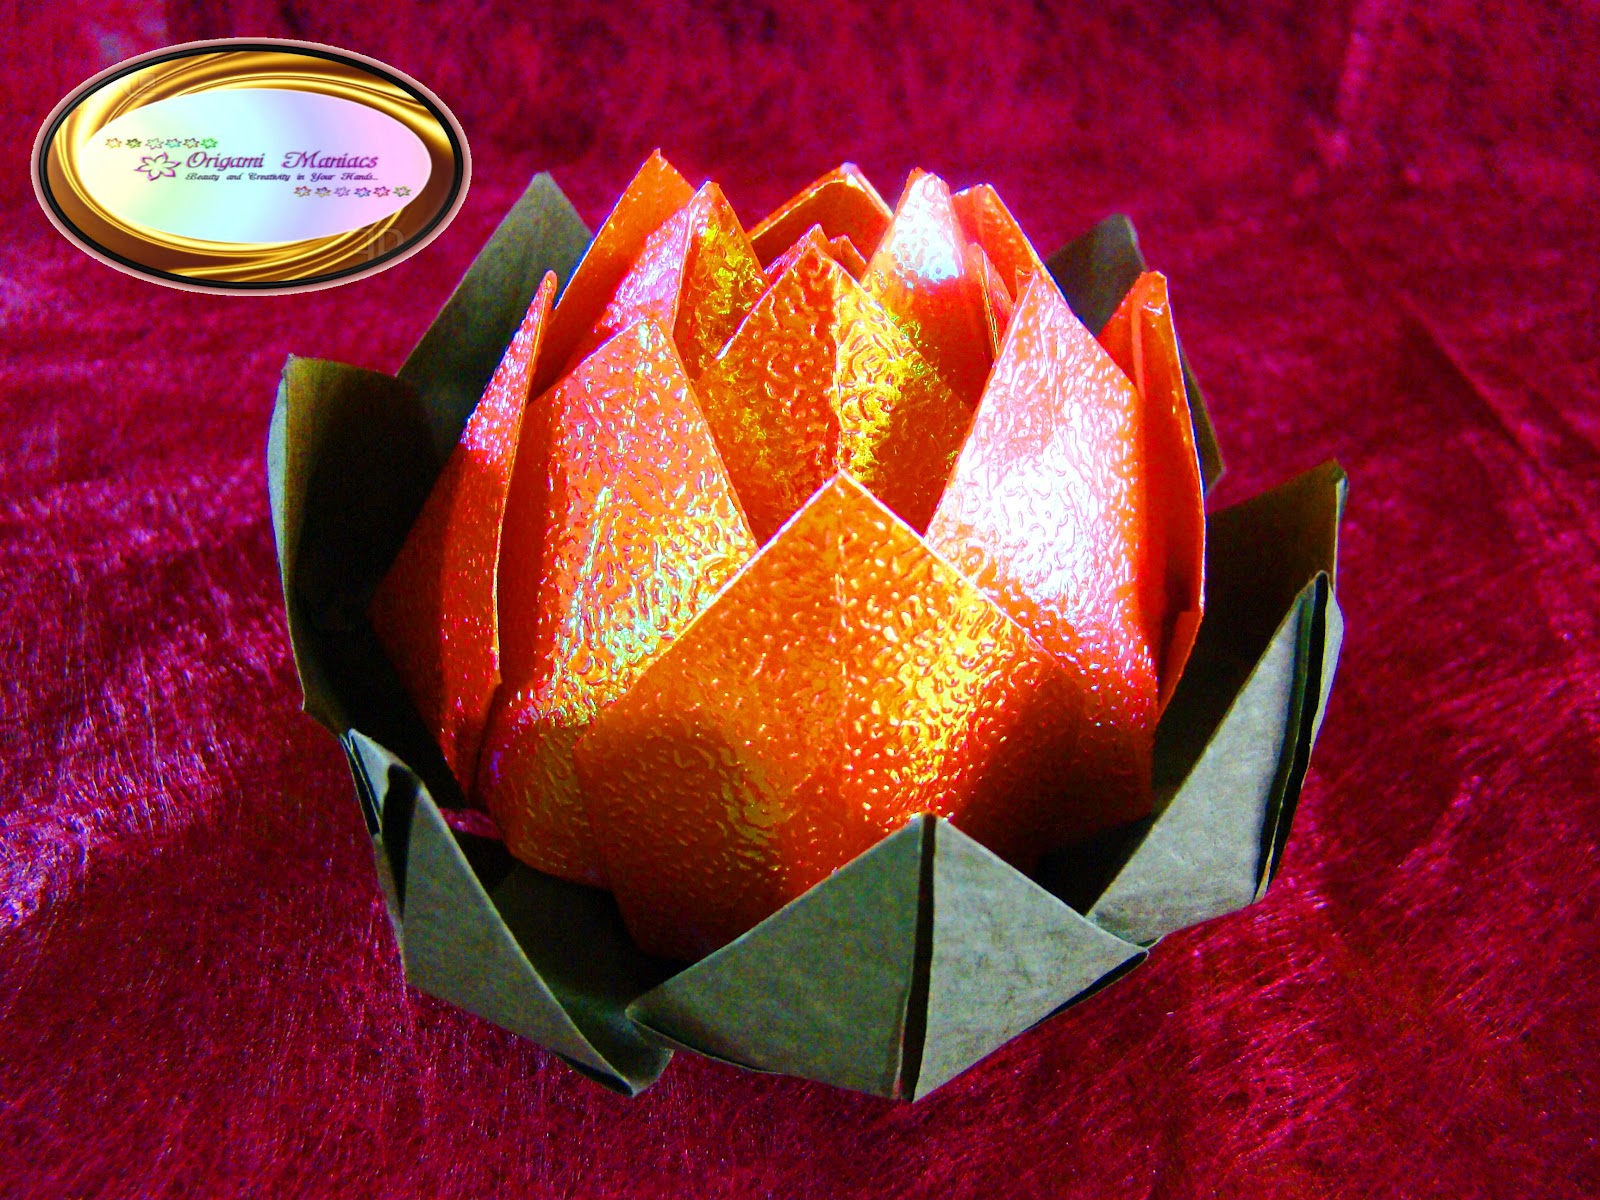 Origami Maniacs: Beautiful Origami Lotus Flower